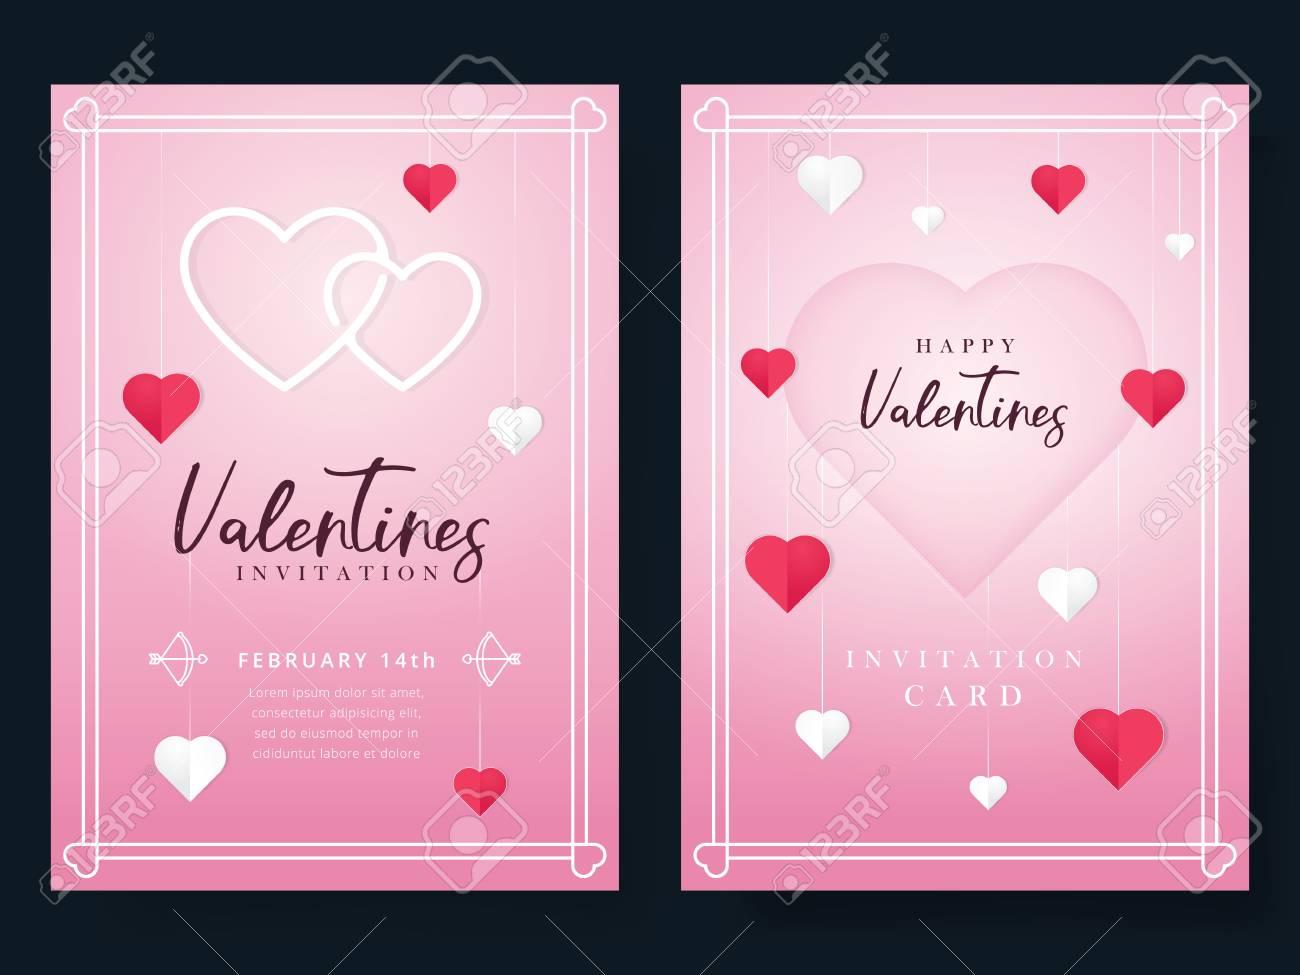 Valentines Day Invitation Beautiful Greeting Or Invitation Cards